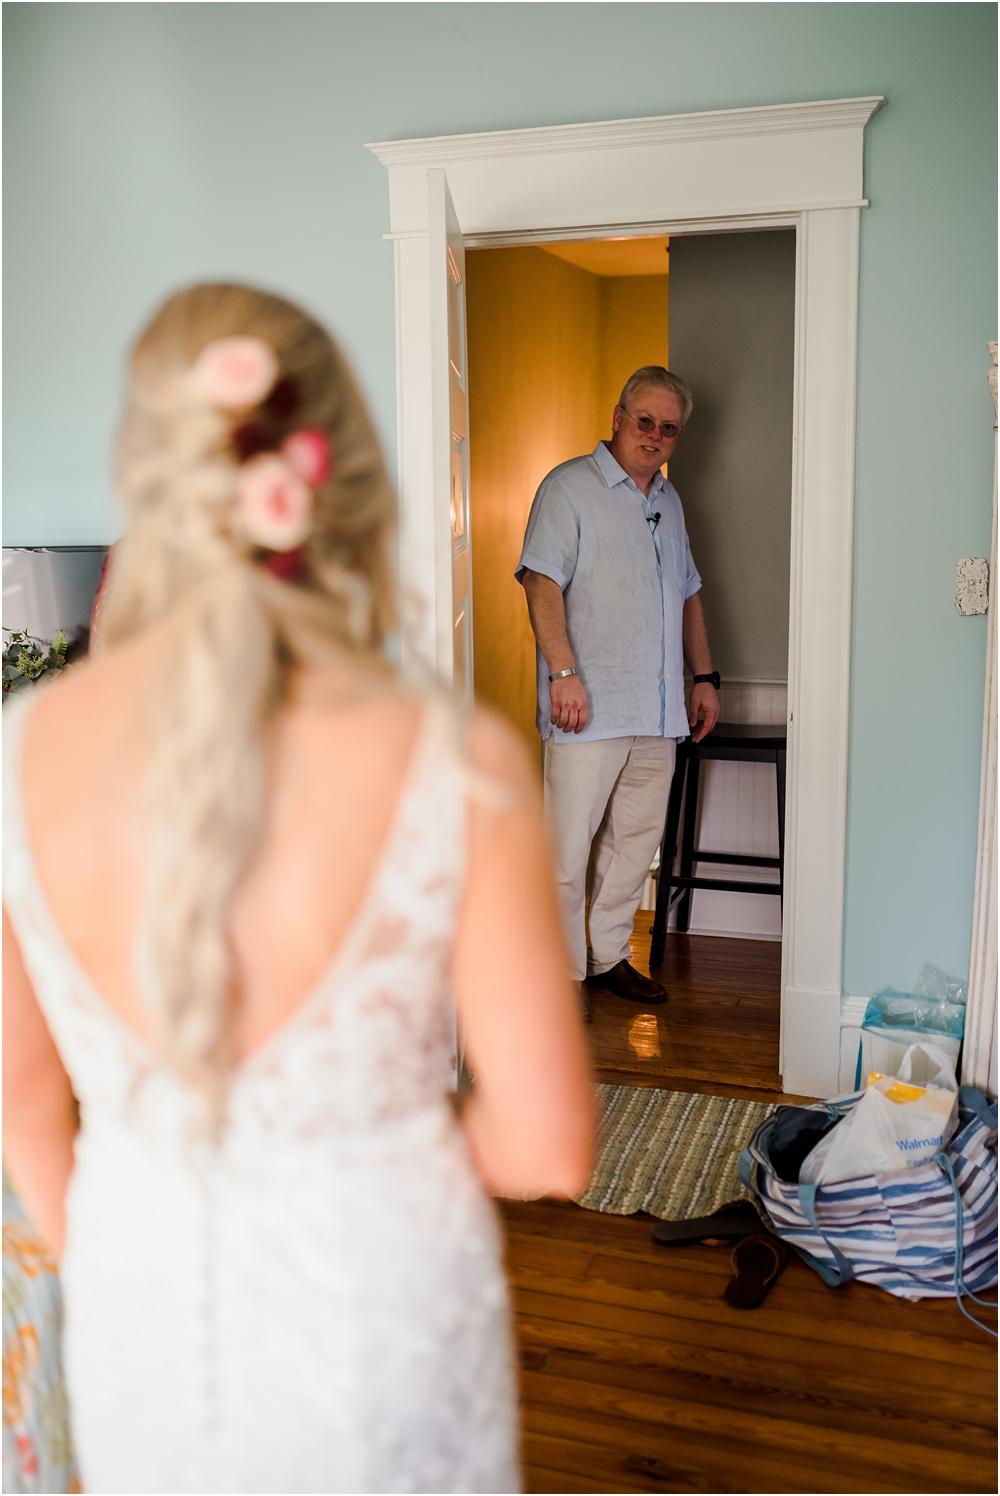 mcglothlin-wedding-kiersten-stevenson-photography-30a-panama-city-beach-dothan-tallahassee-(38-of-145).jpg